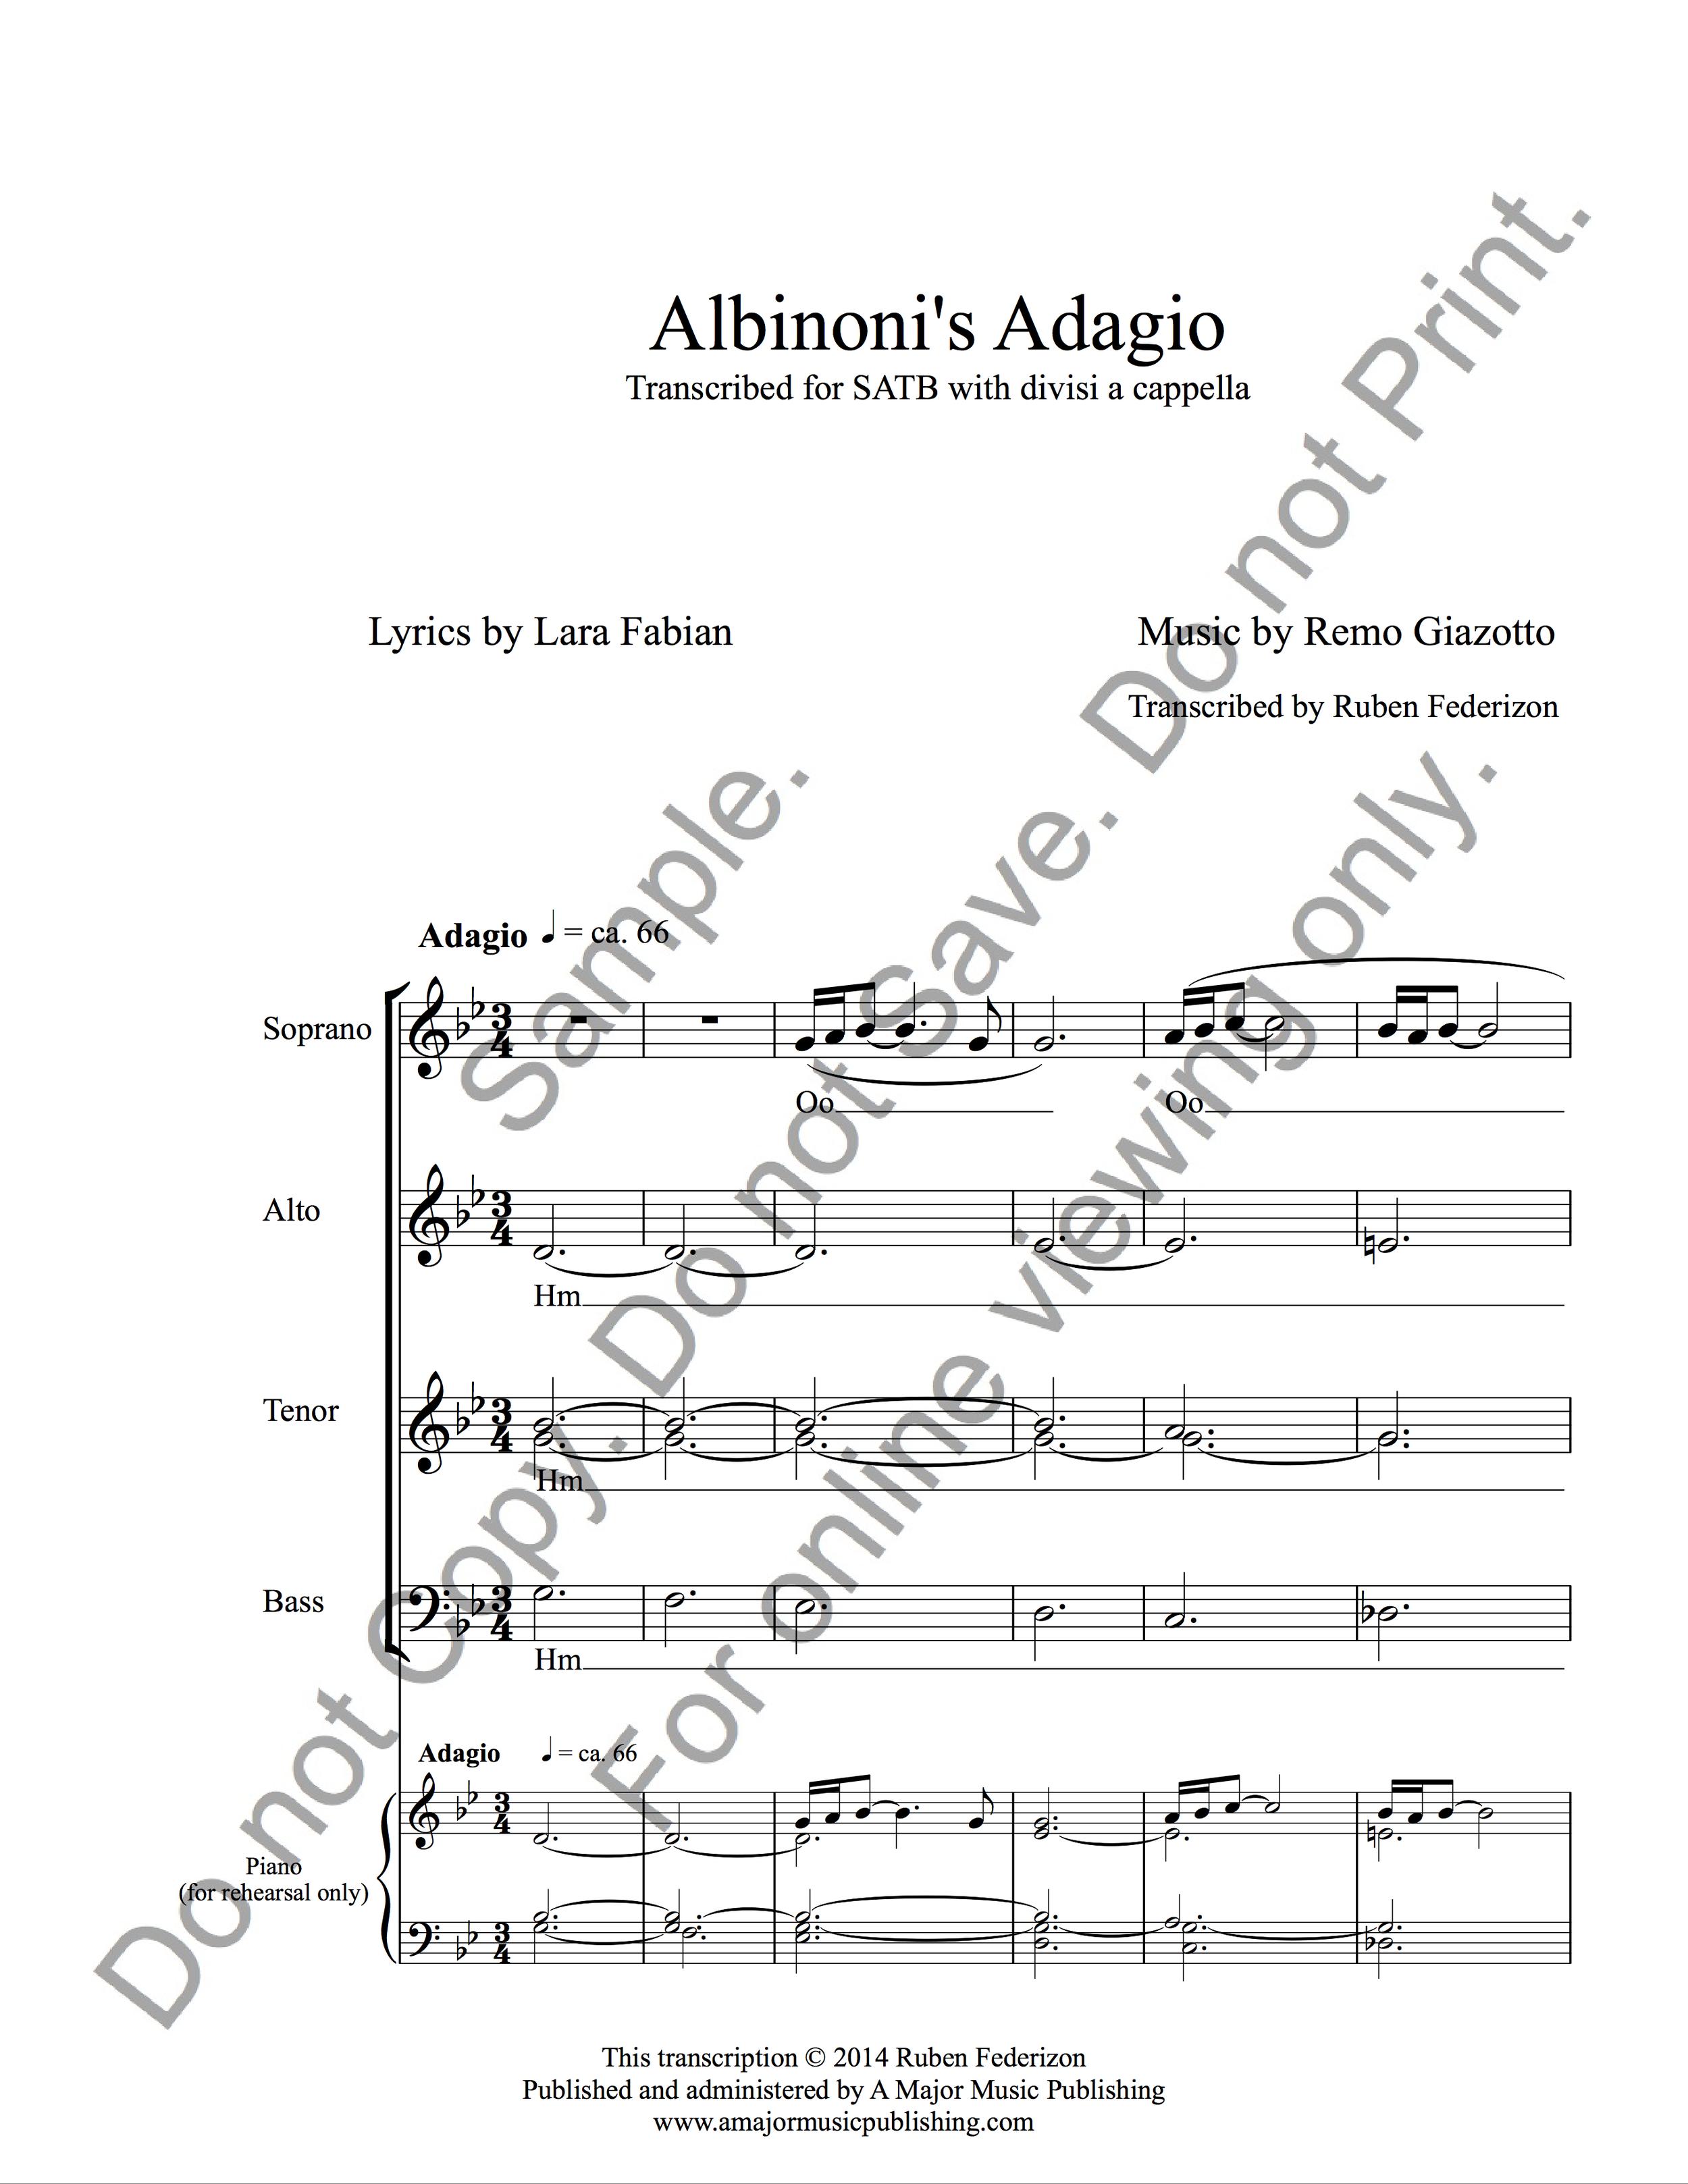 Albinoni's Adagio07_0002.png